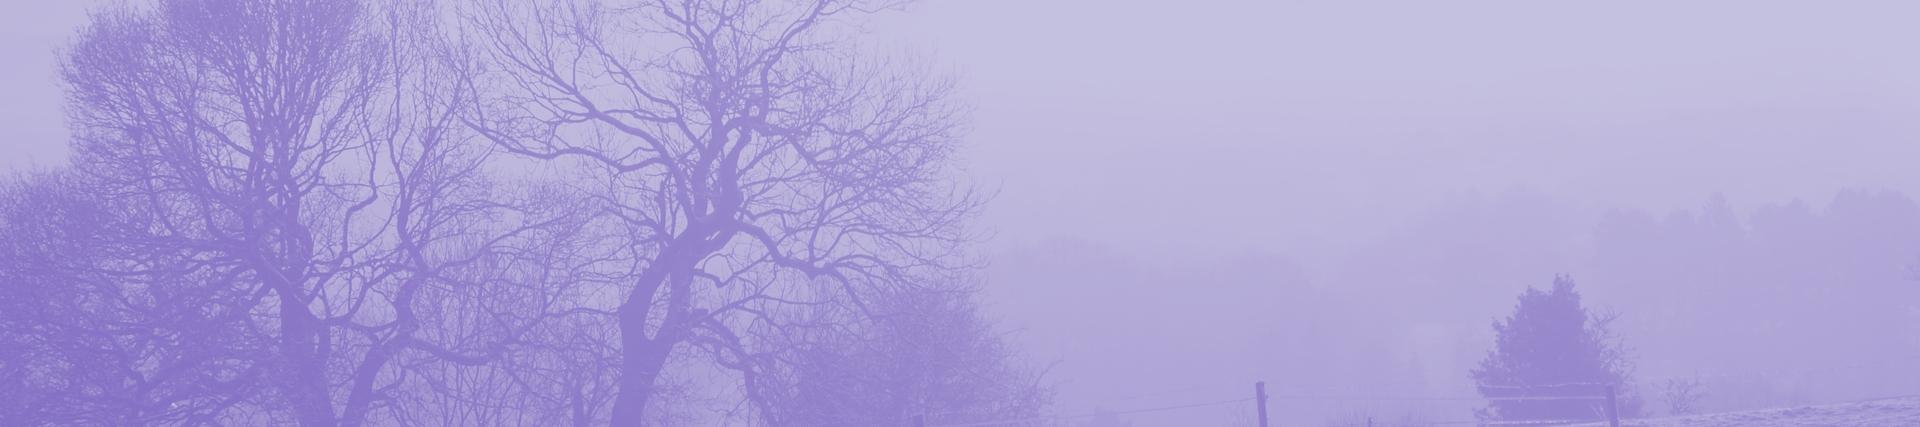 Image of a landscape under snow